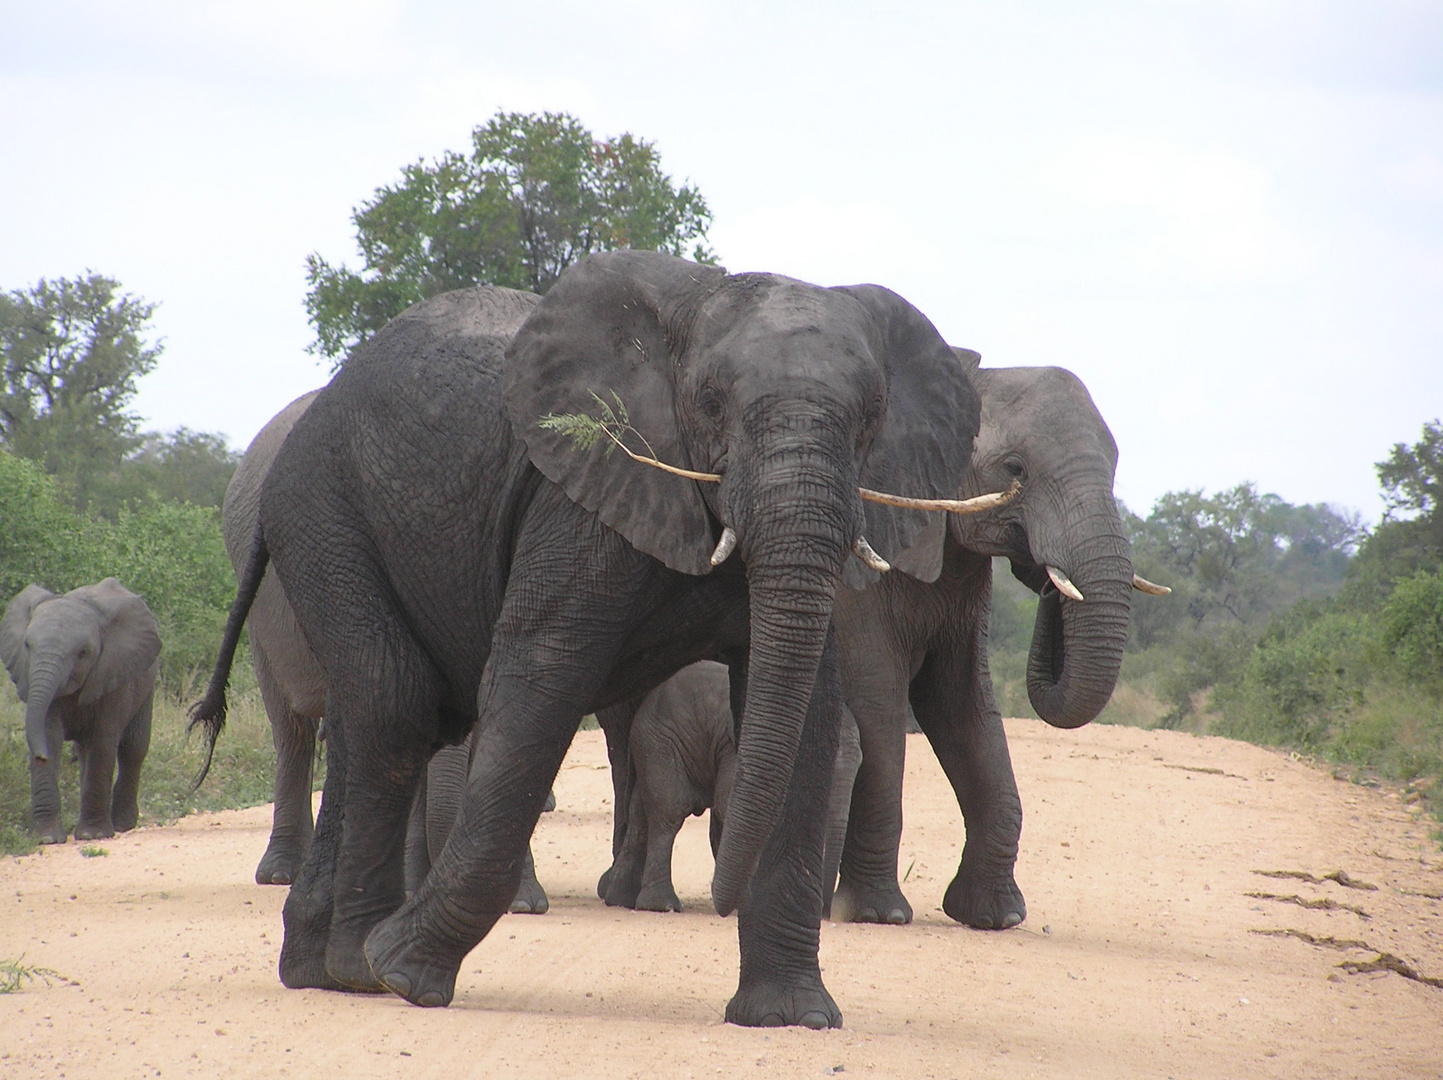 Drohgebärde eines Elefantenjungbullen